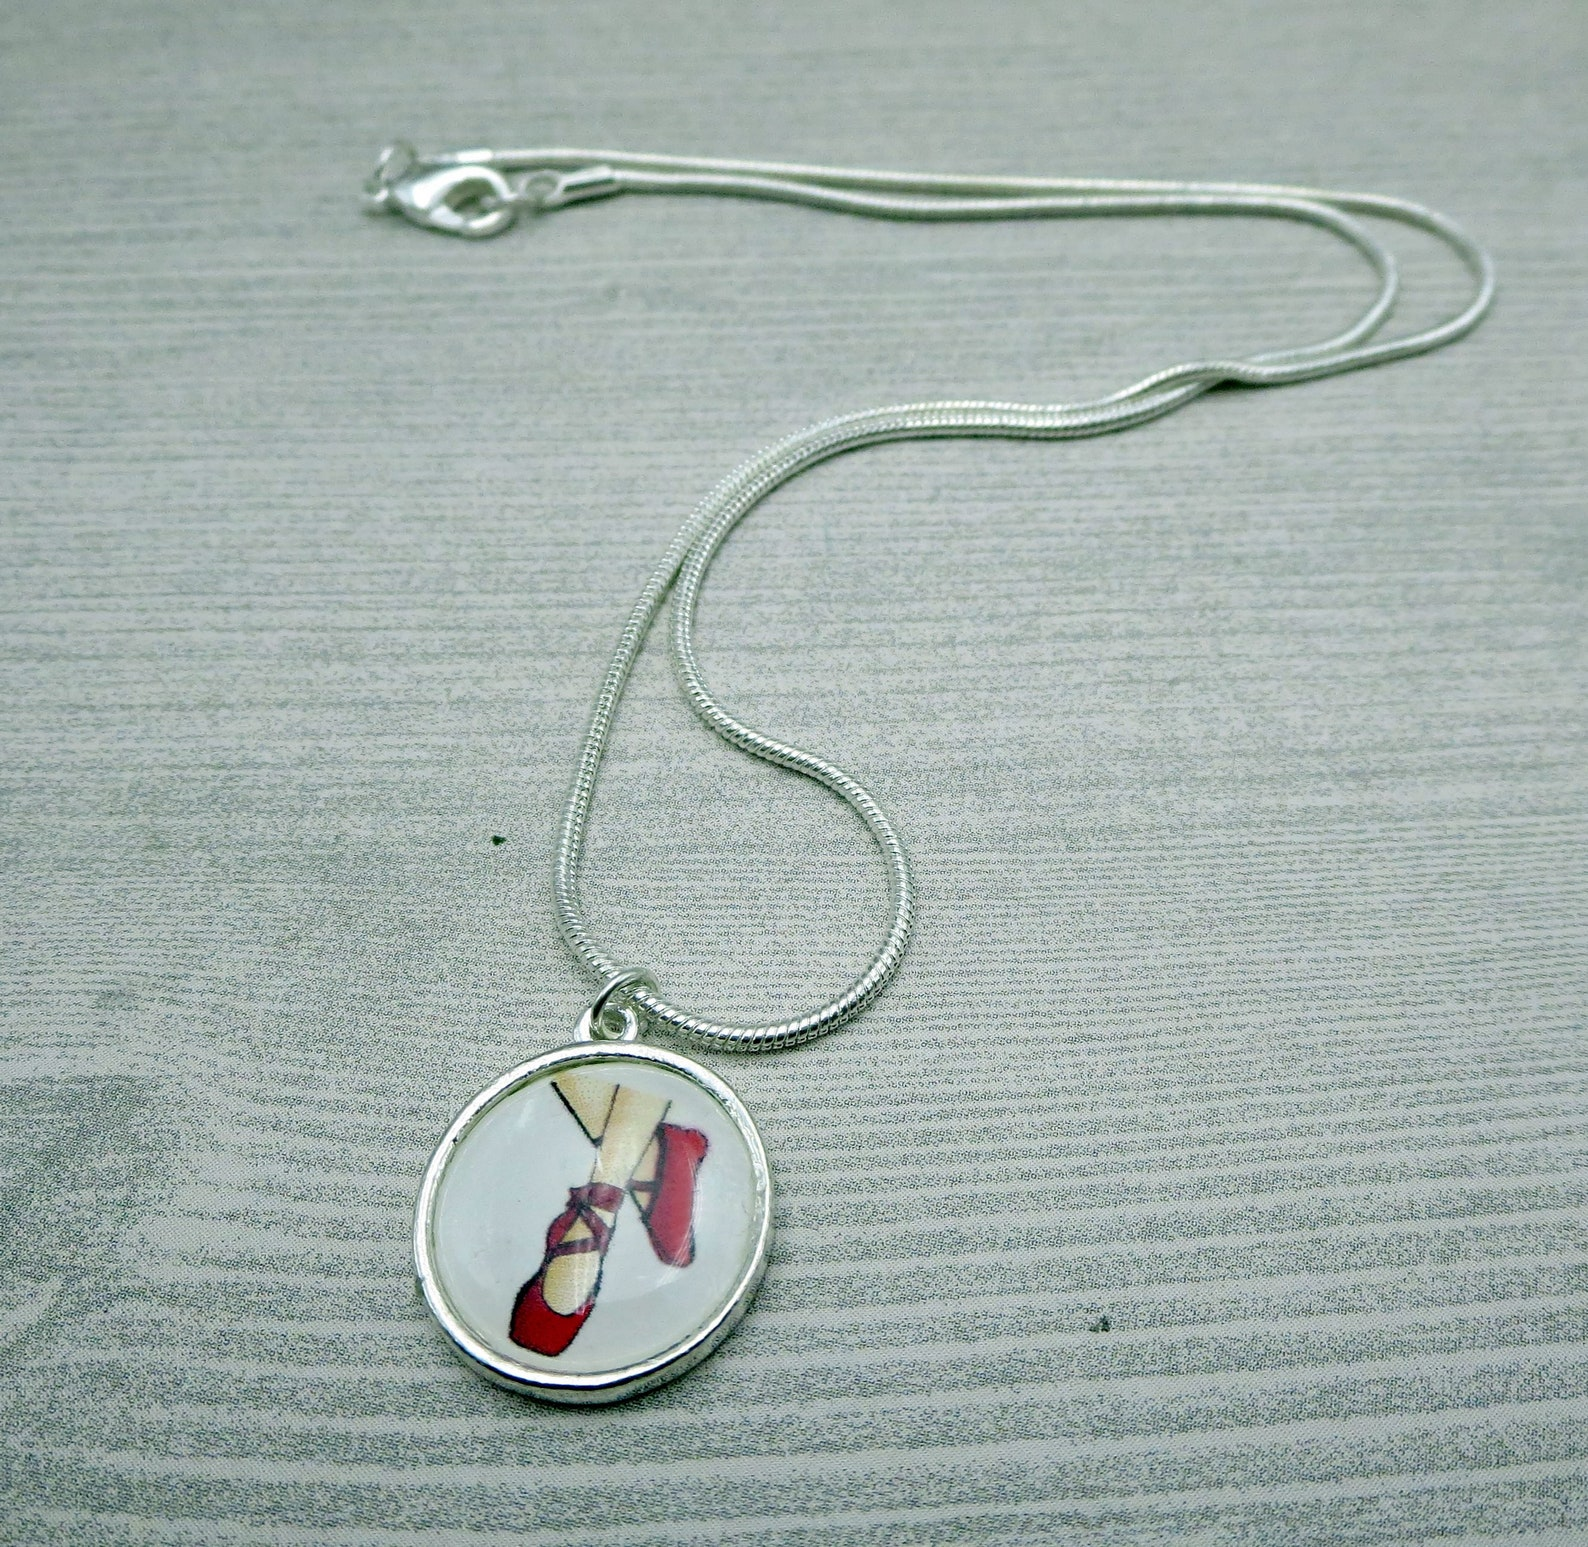 red pointe ballet slippers necklace, pendant for dancers, gift for favorite dance teacher, present for dance recital, lover of t